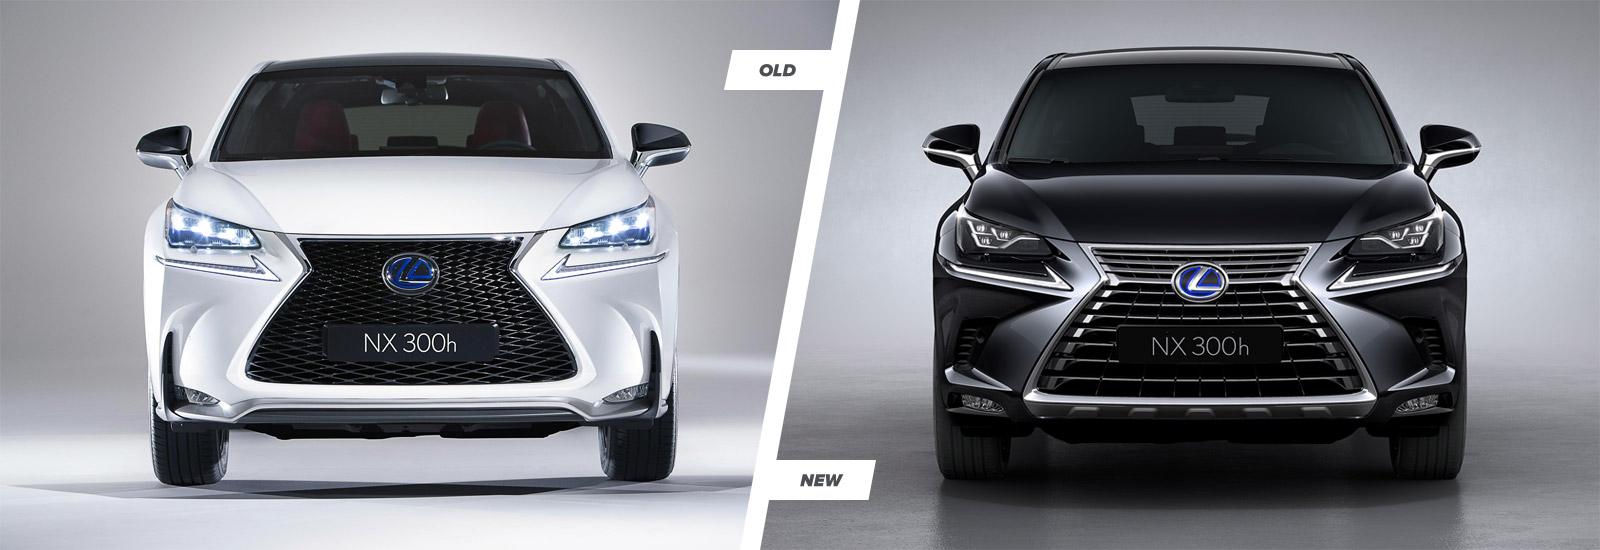 2018 lexus hybrid. wonderful lexus 2018 lexus nx facelift styling intended lexus hybrid g